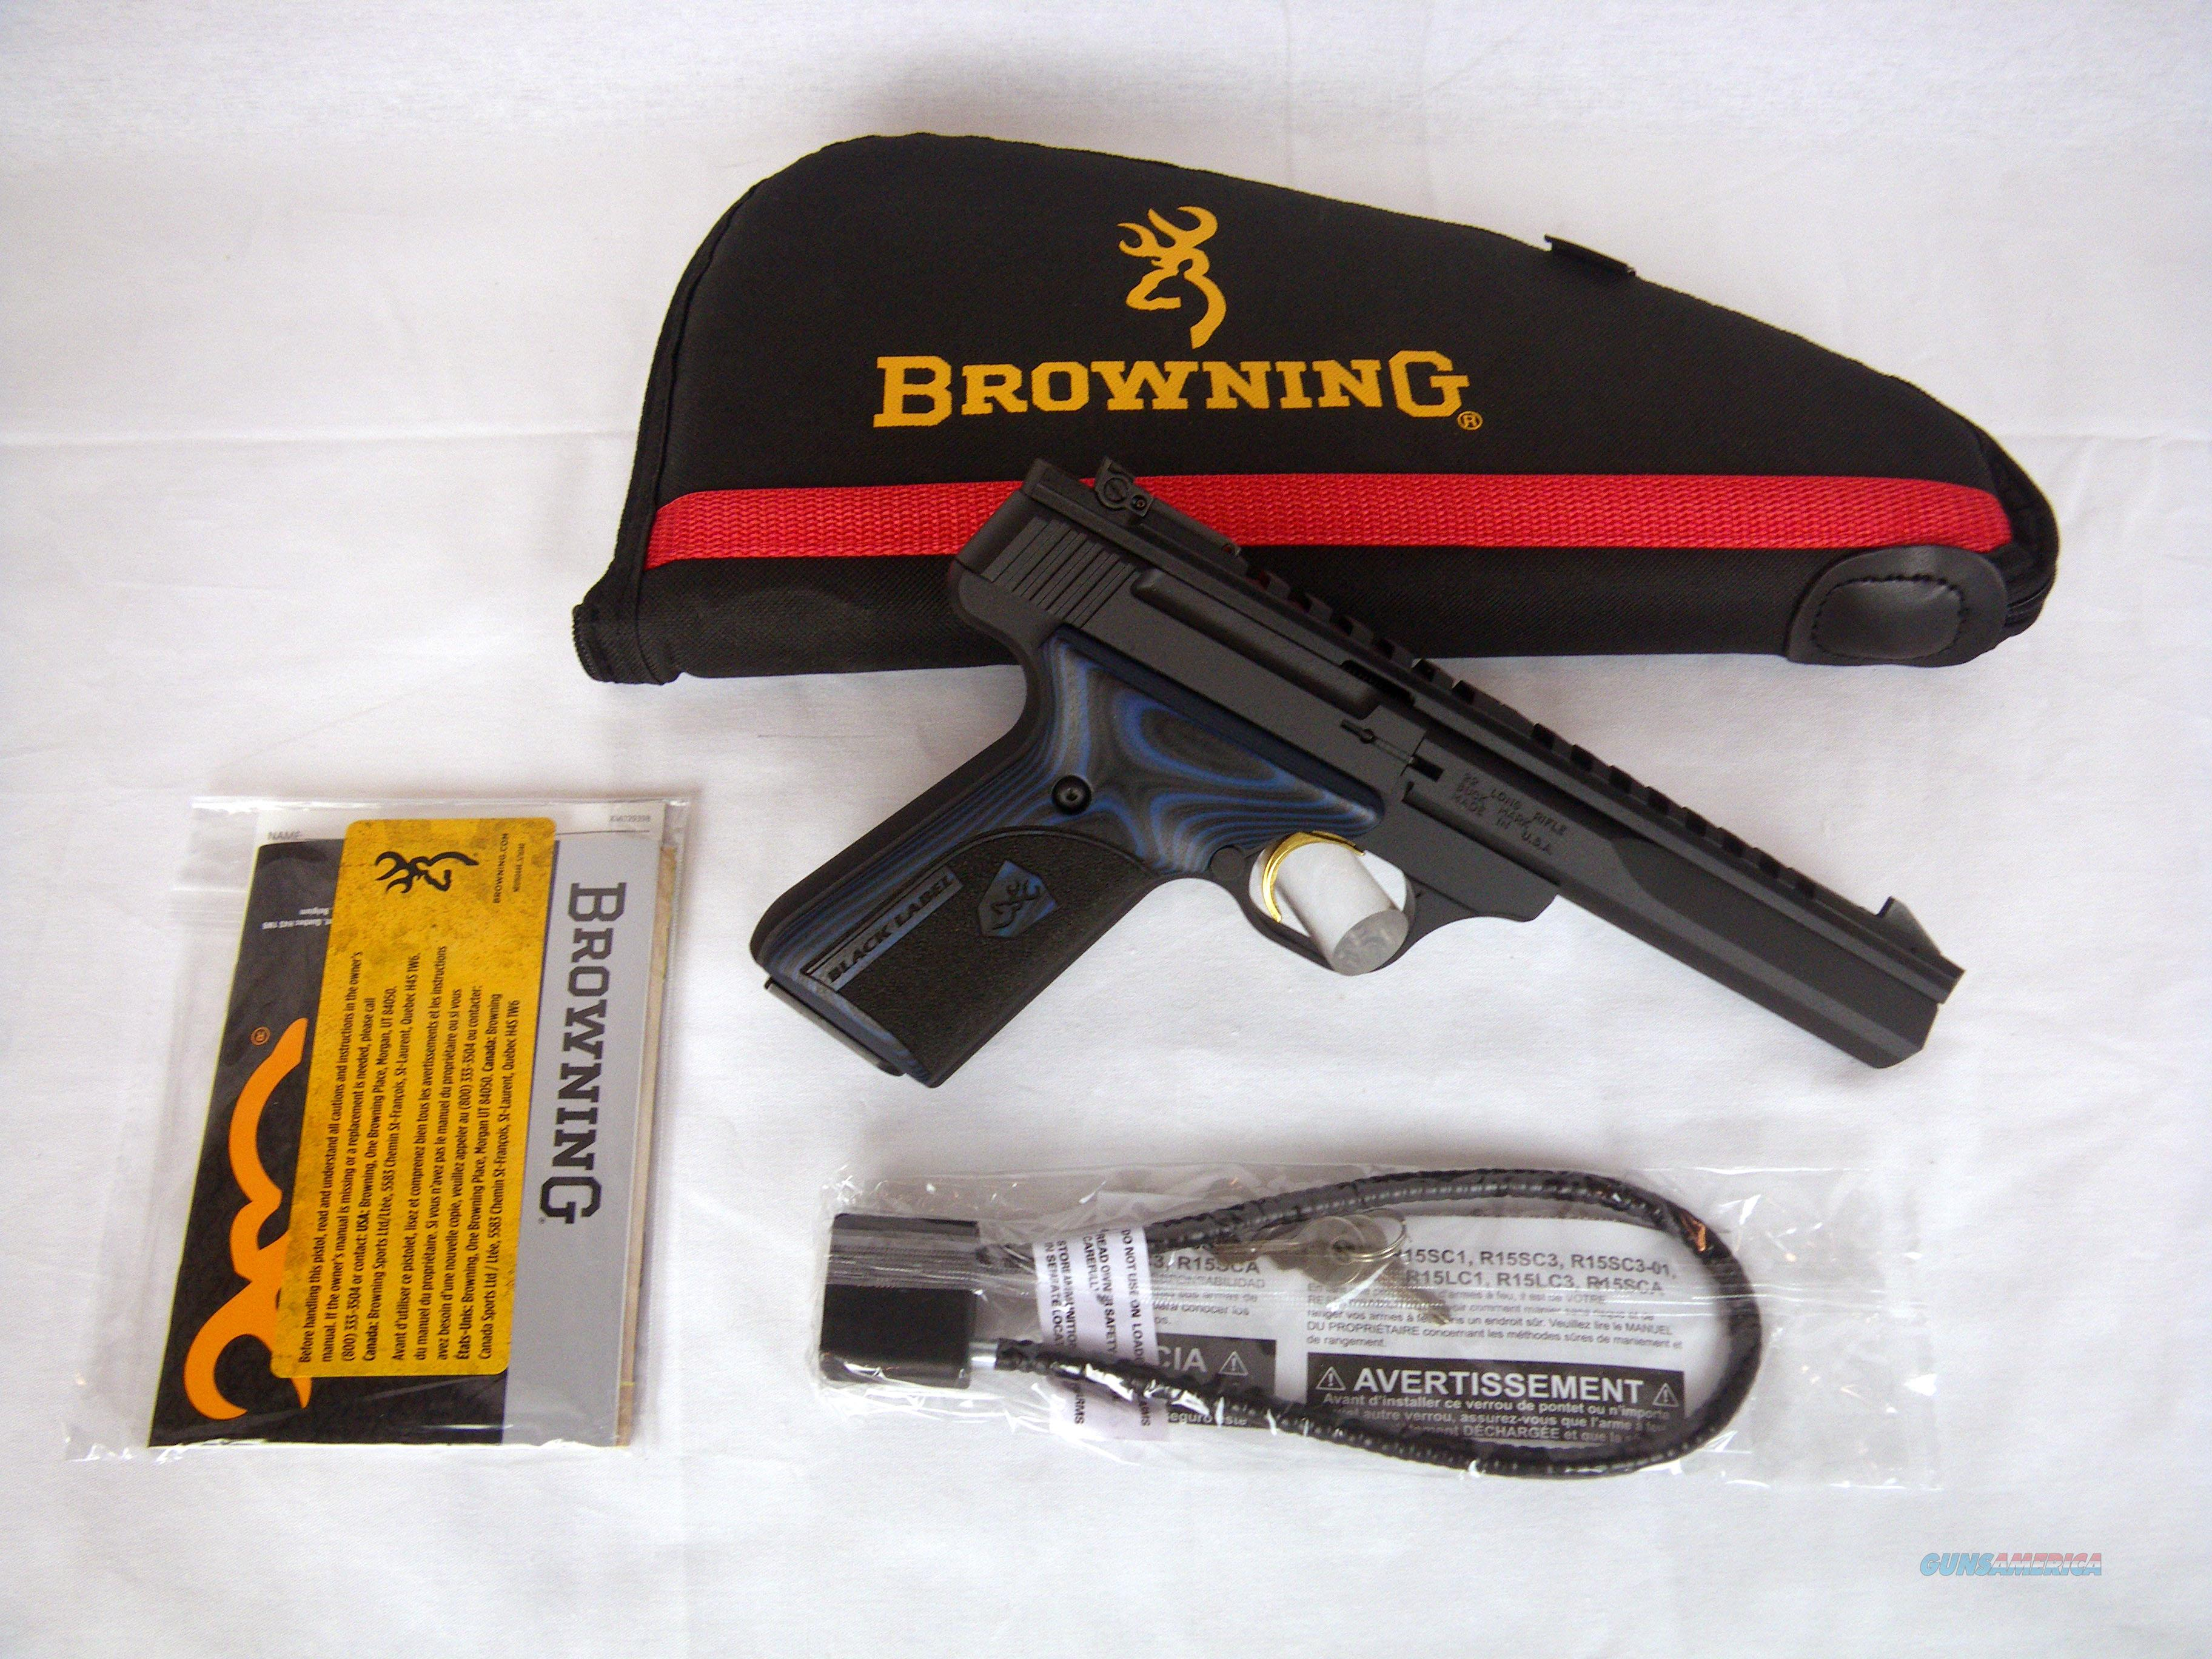 "Browning Buckmark Black Label Contour 22lr 5.5"" NEW 051535490  Guns > Pistols > Browning Pistols > Buckmark"